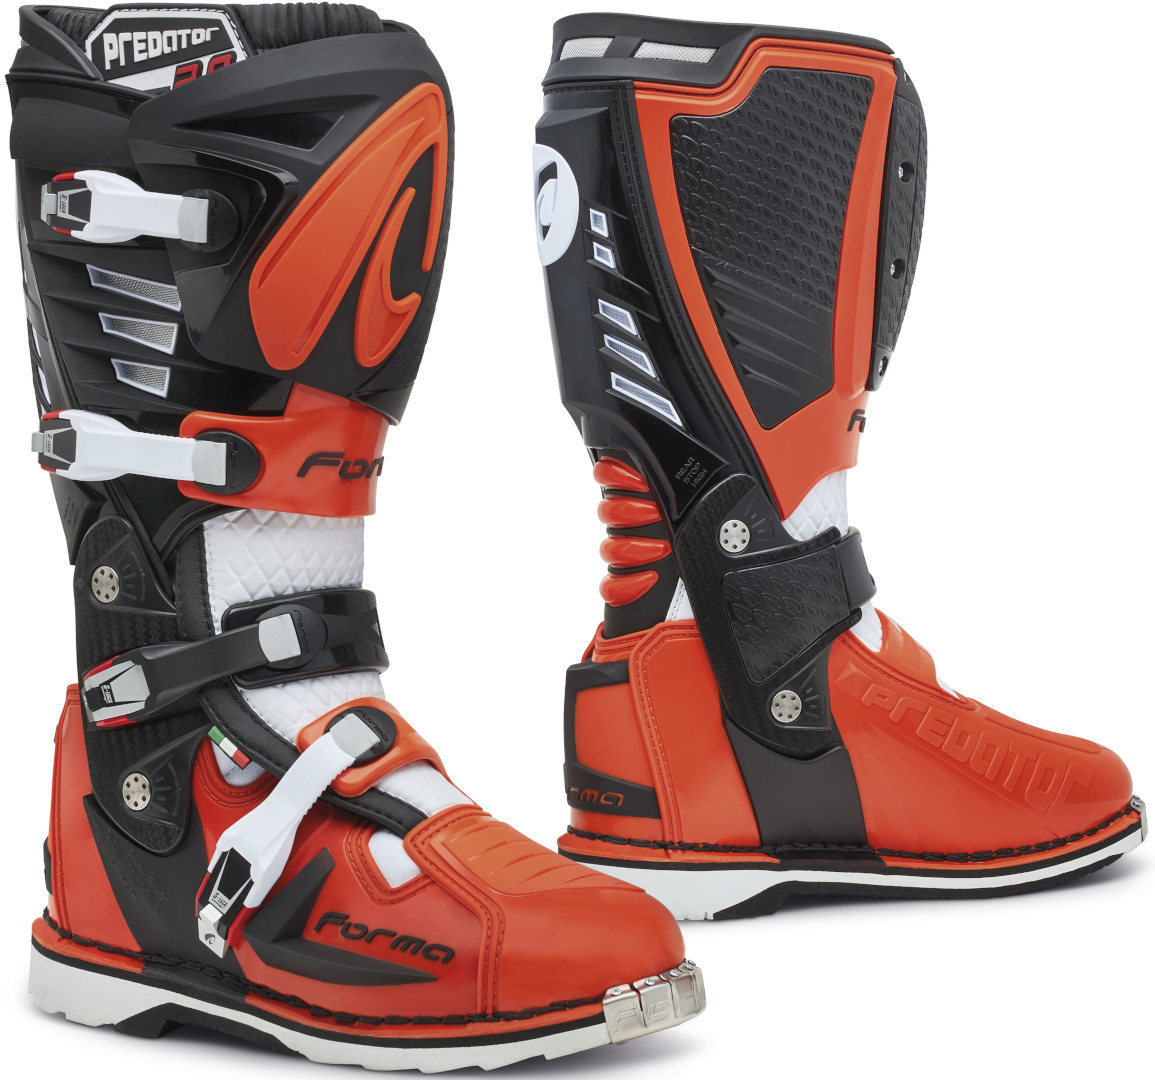 Forma Predator 2.0 Motocross Stiefel, schwarz-weiss-orange, Größe 42, schwarz-weiss-orange, Größe 42